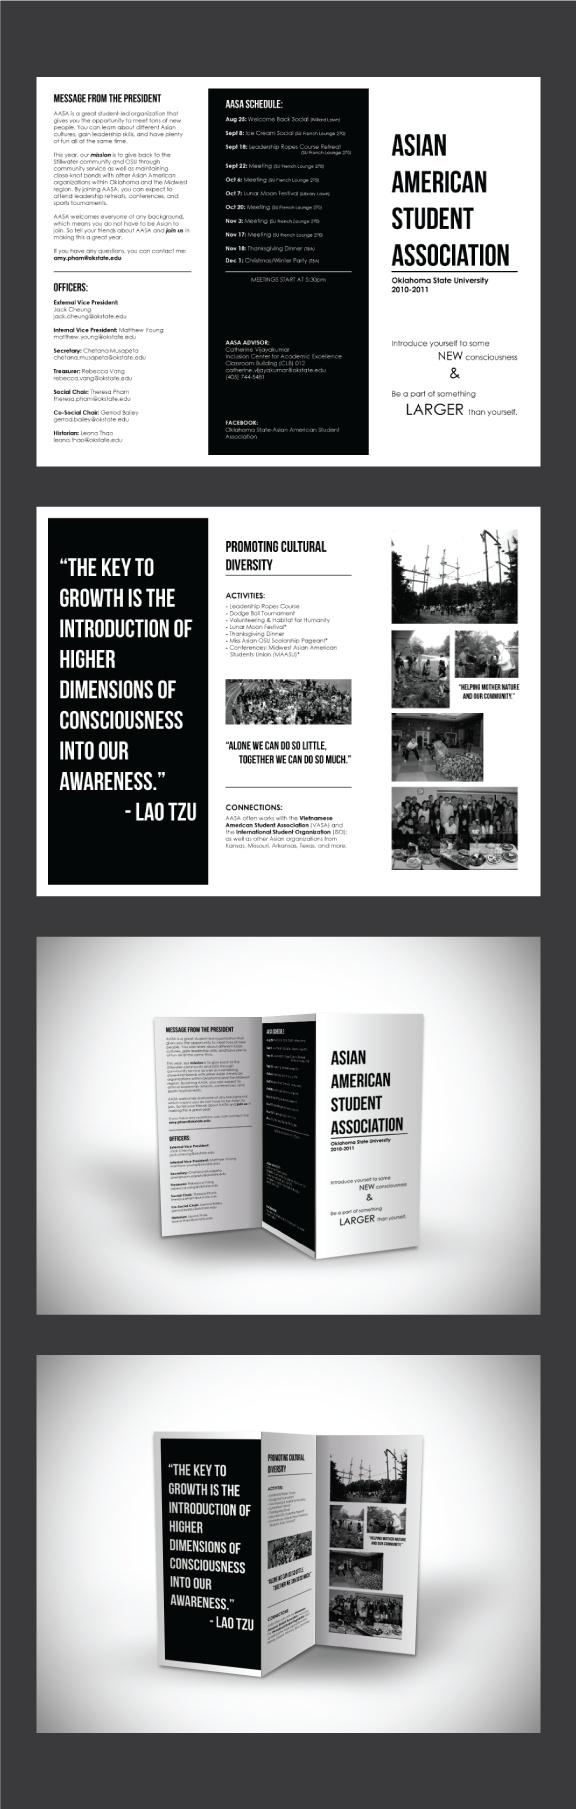 AASA Brochure 2010-2011 by Nalee Thao, via Behance